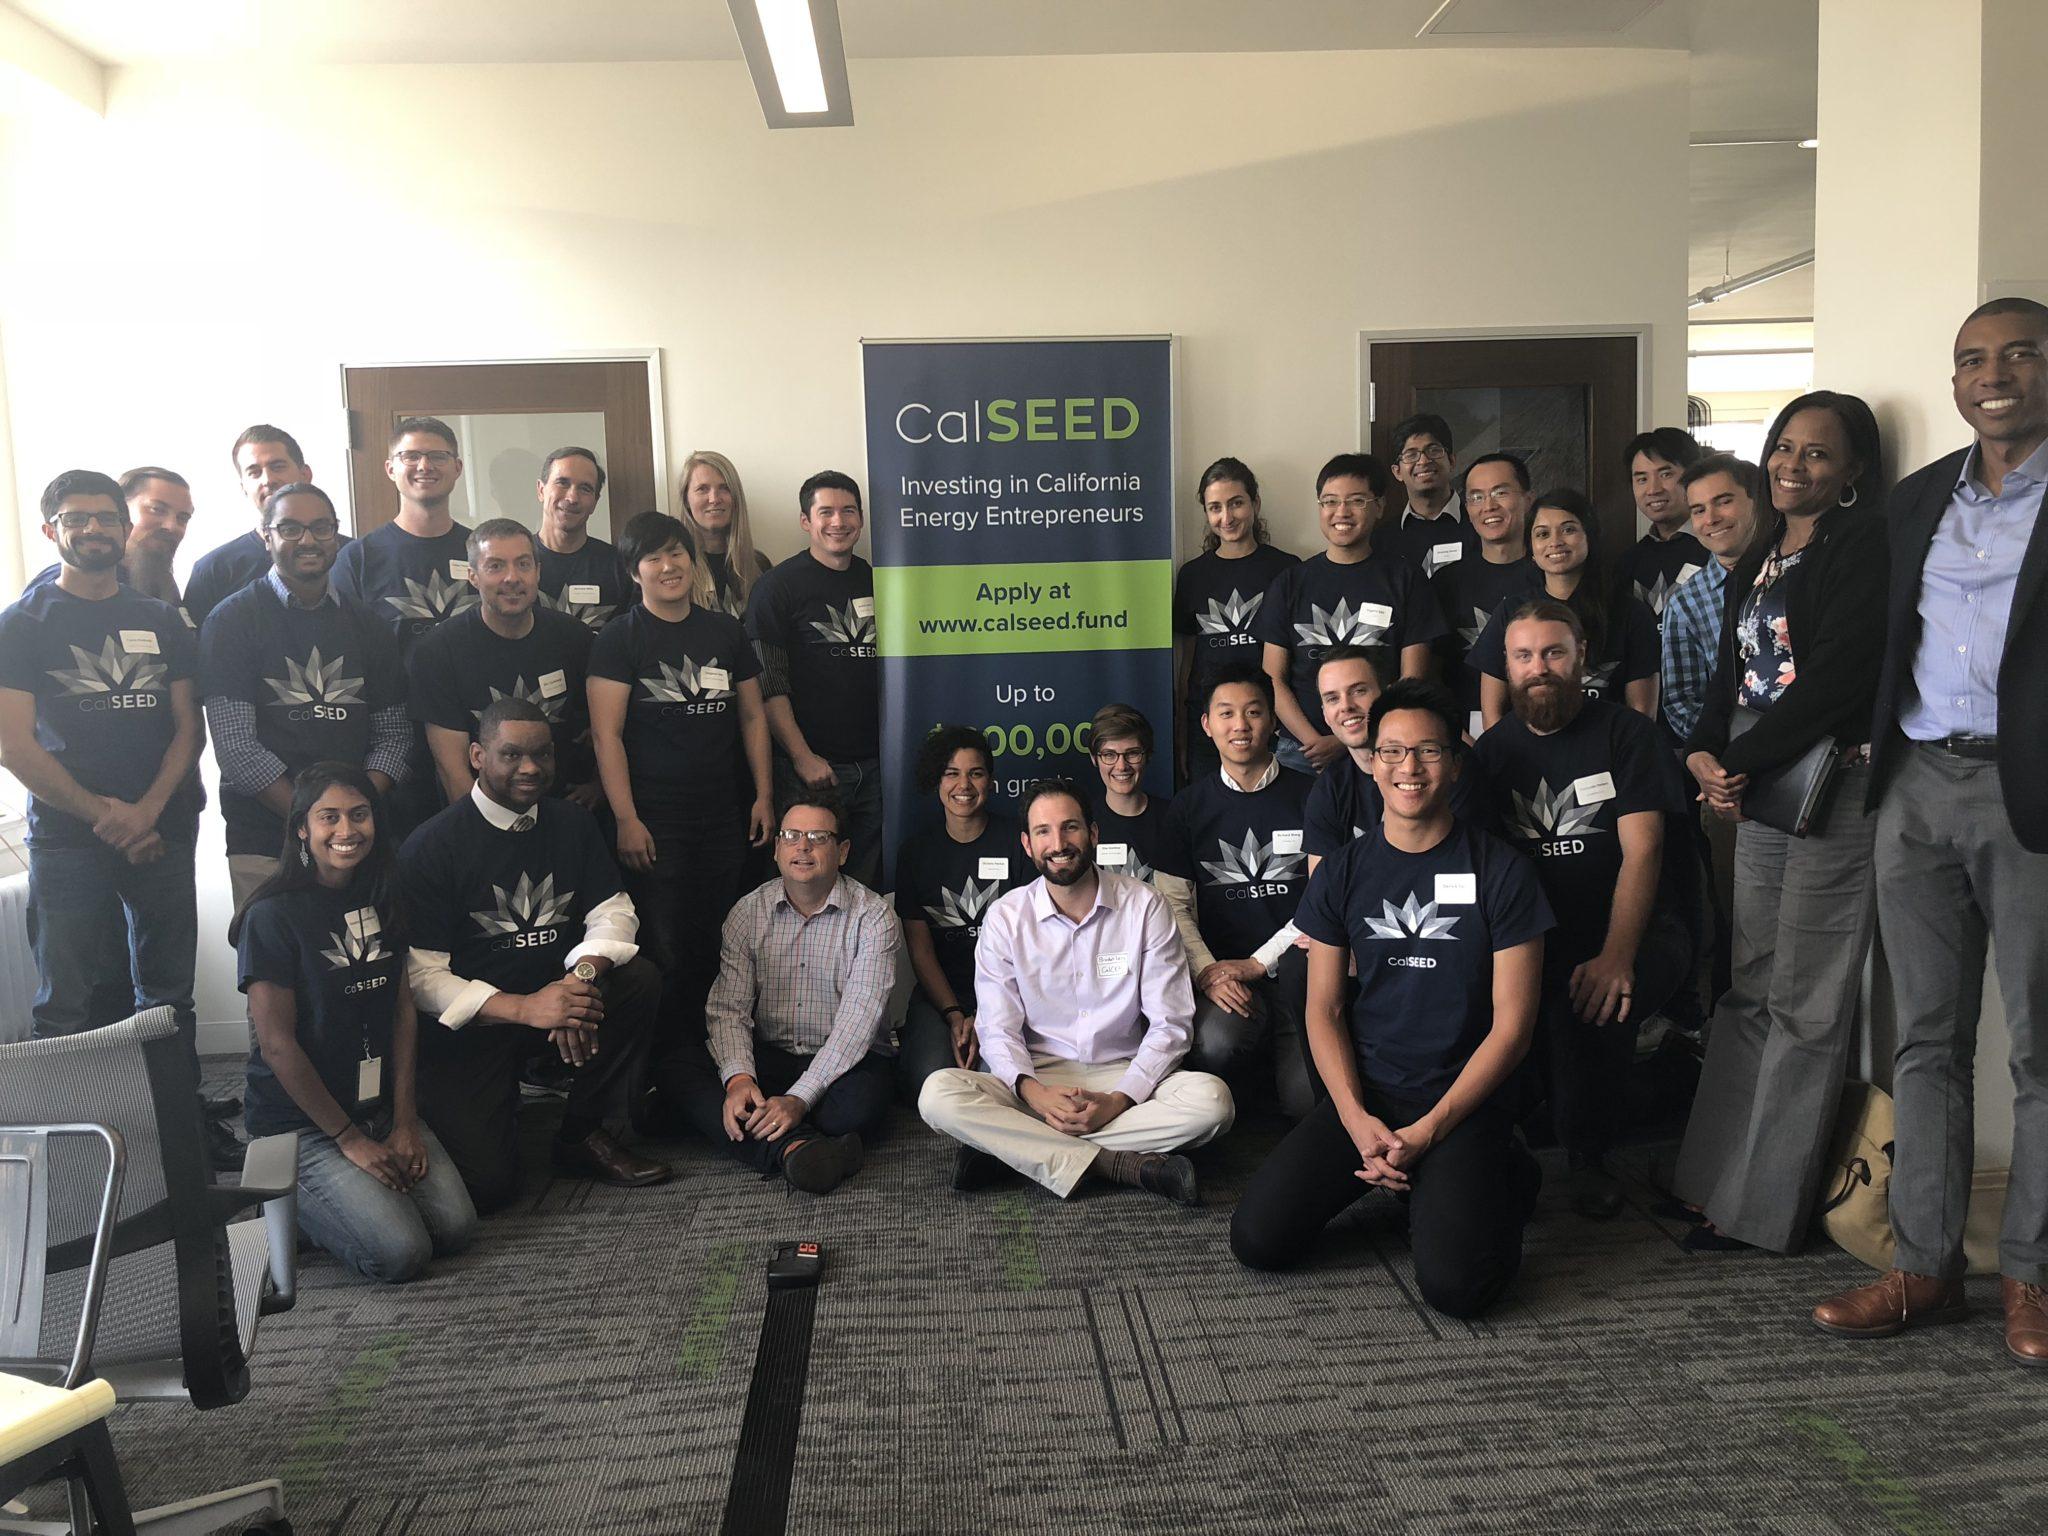 CALSEED clean tech entrepreneurs